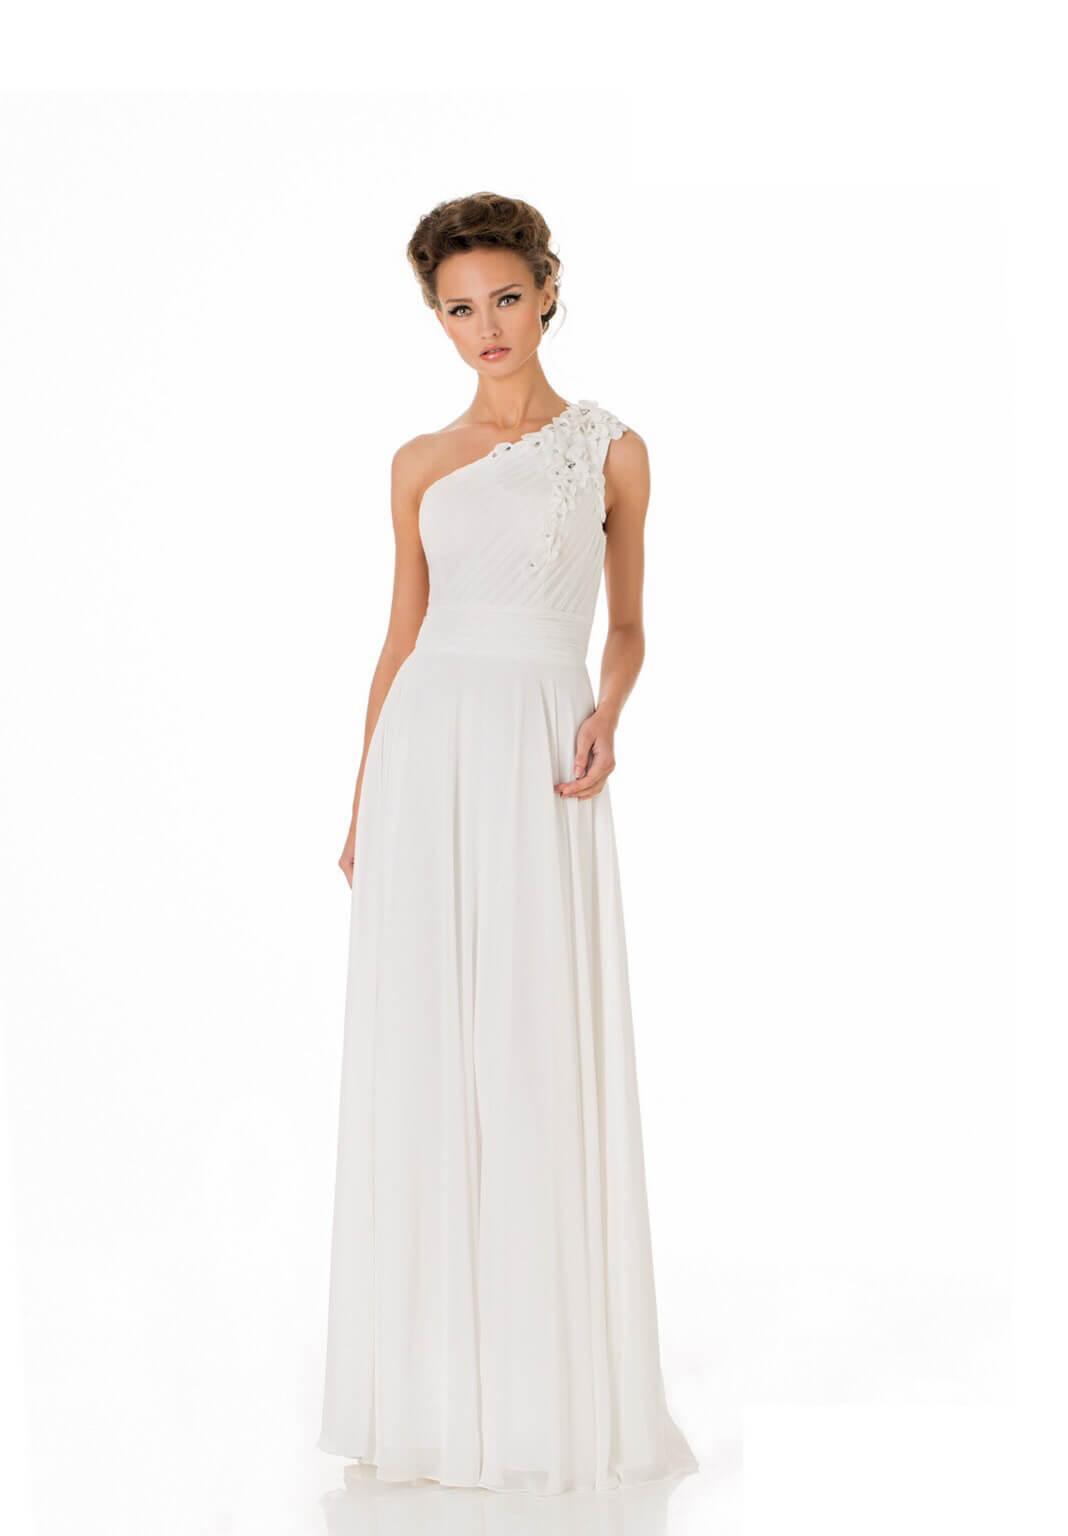 949be655da09 Vestido De Noiva Low Cost Fash